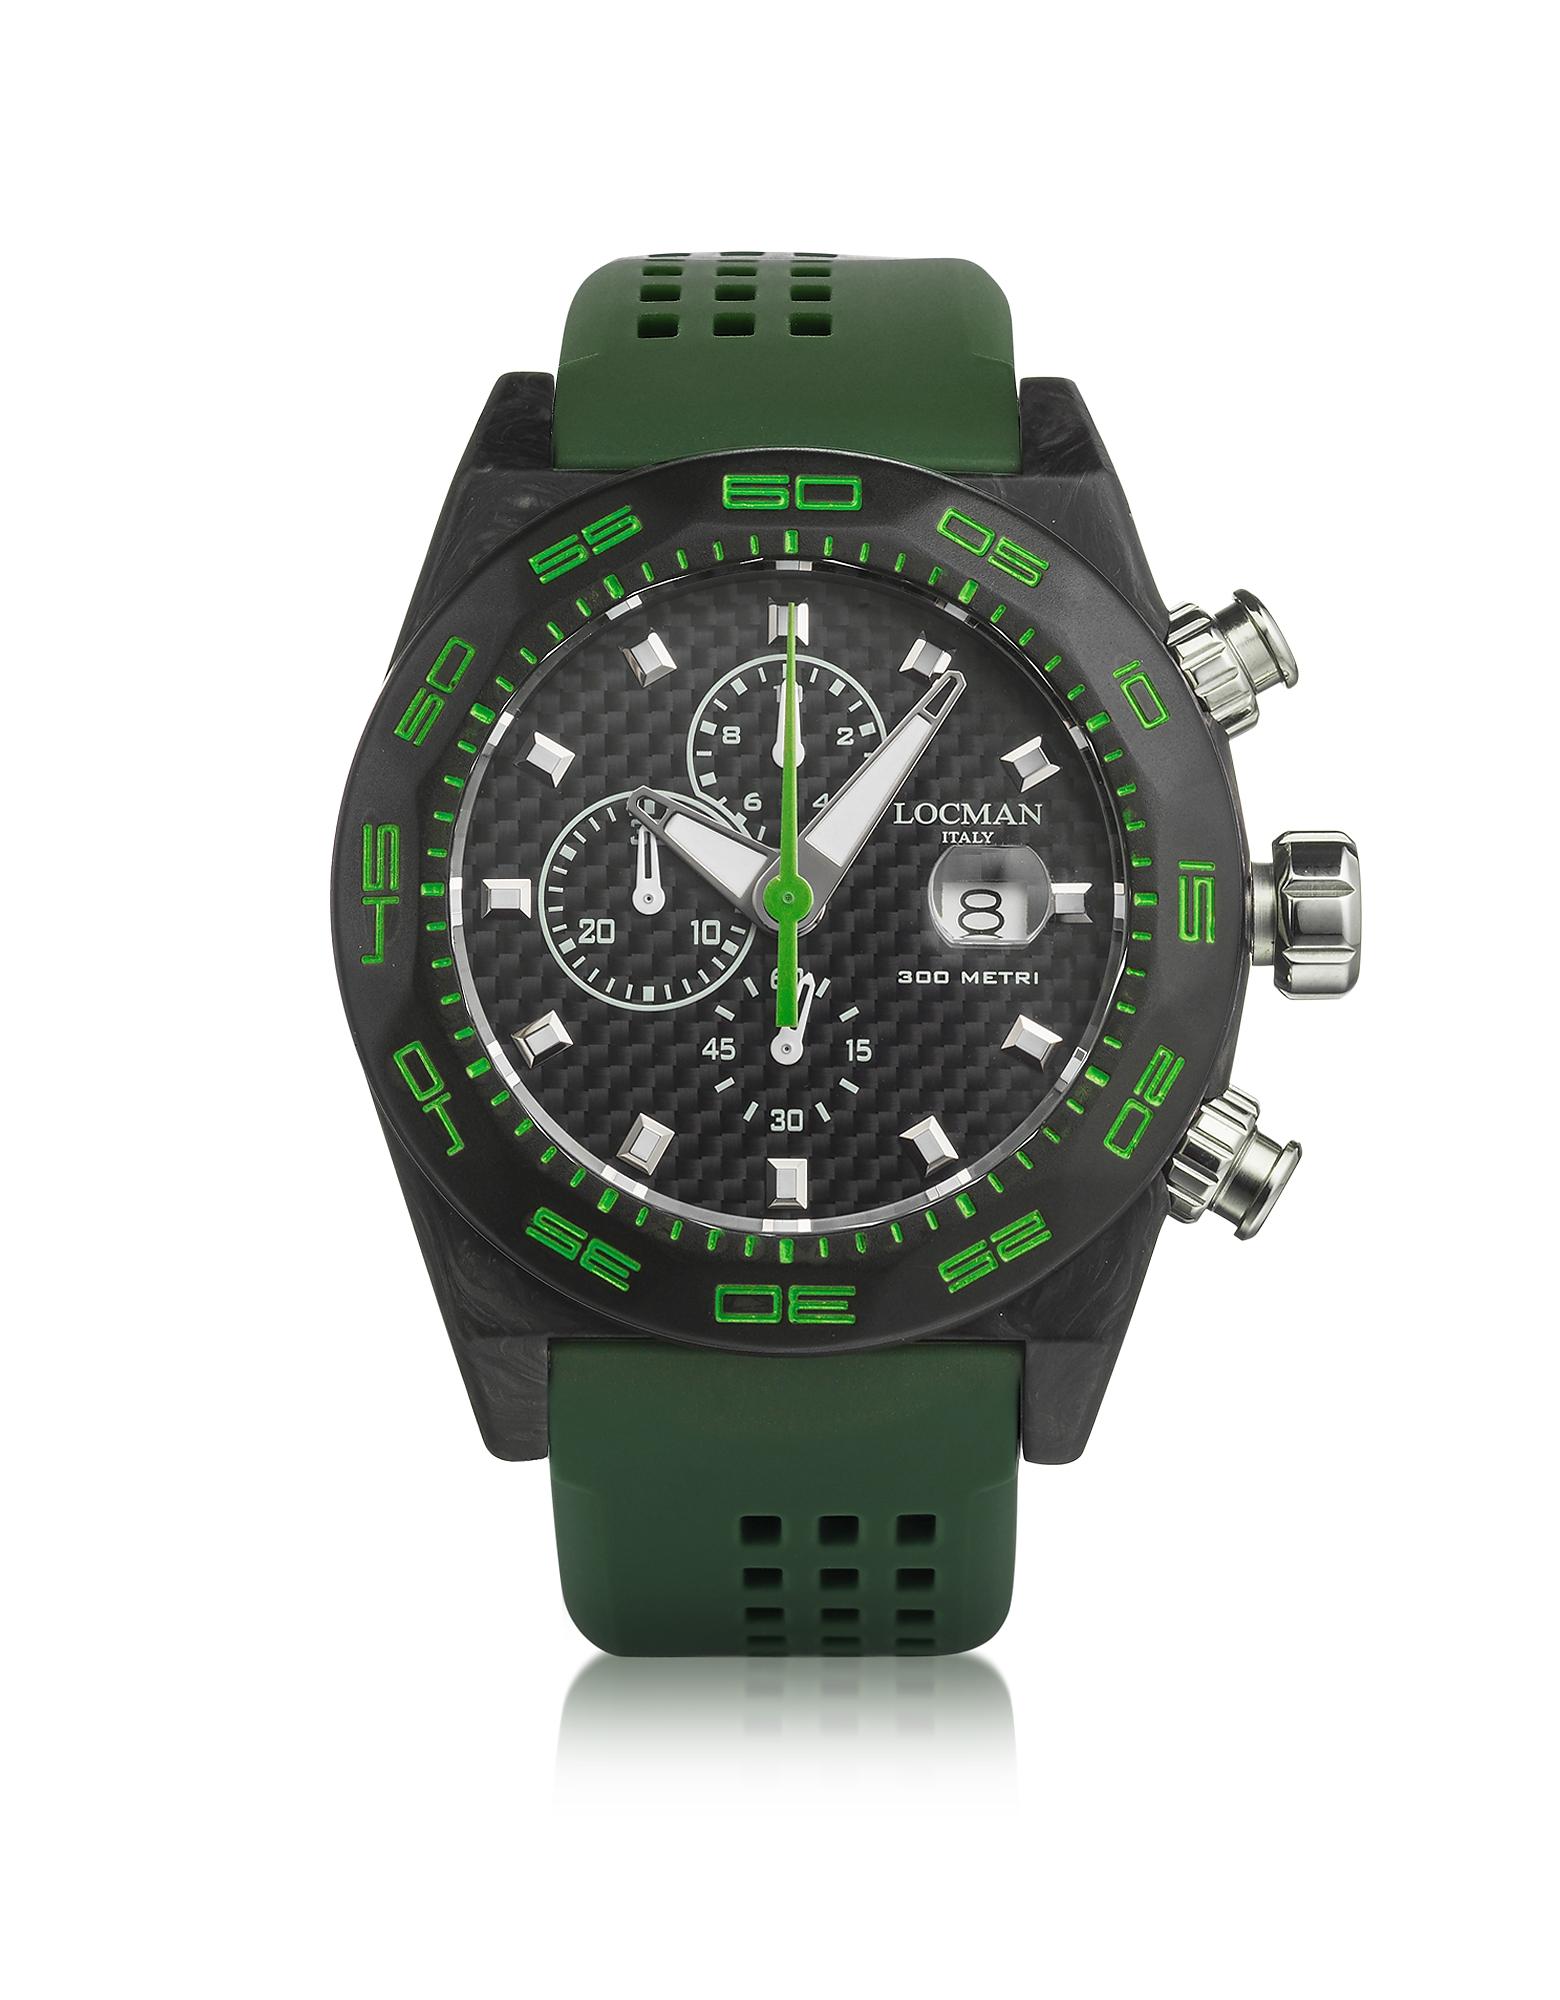 Locman Men's Watches, Stealth 300mt Green Carbon Fiber and Titanium Quartz Movement Men's Chronograp